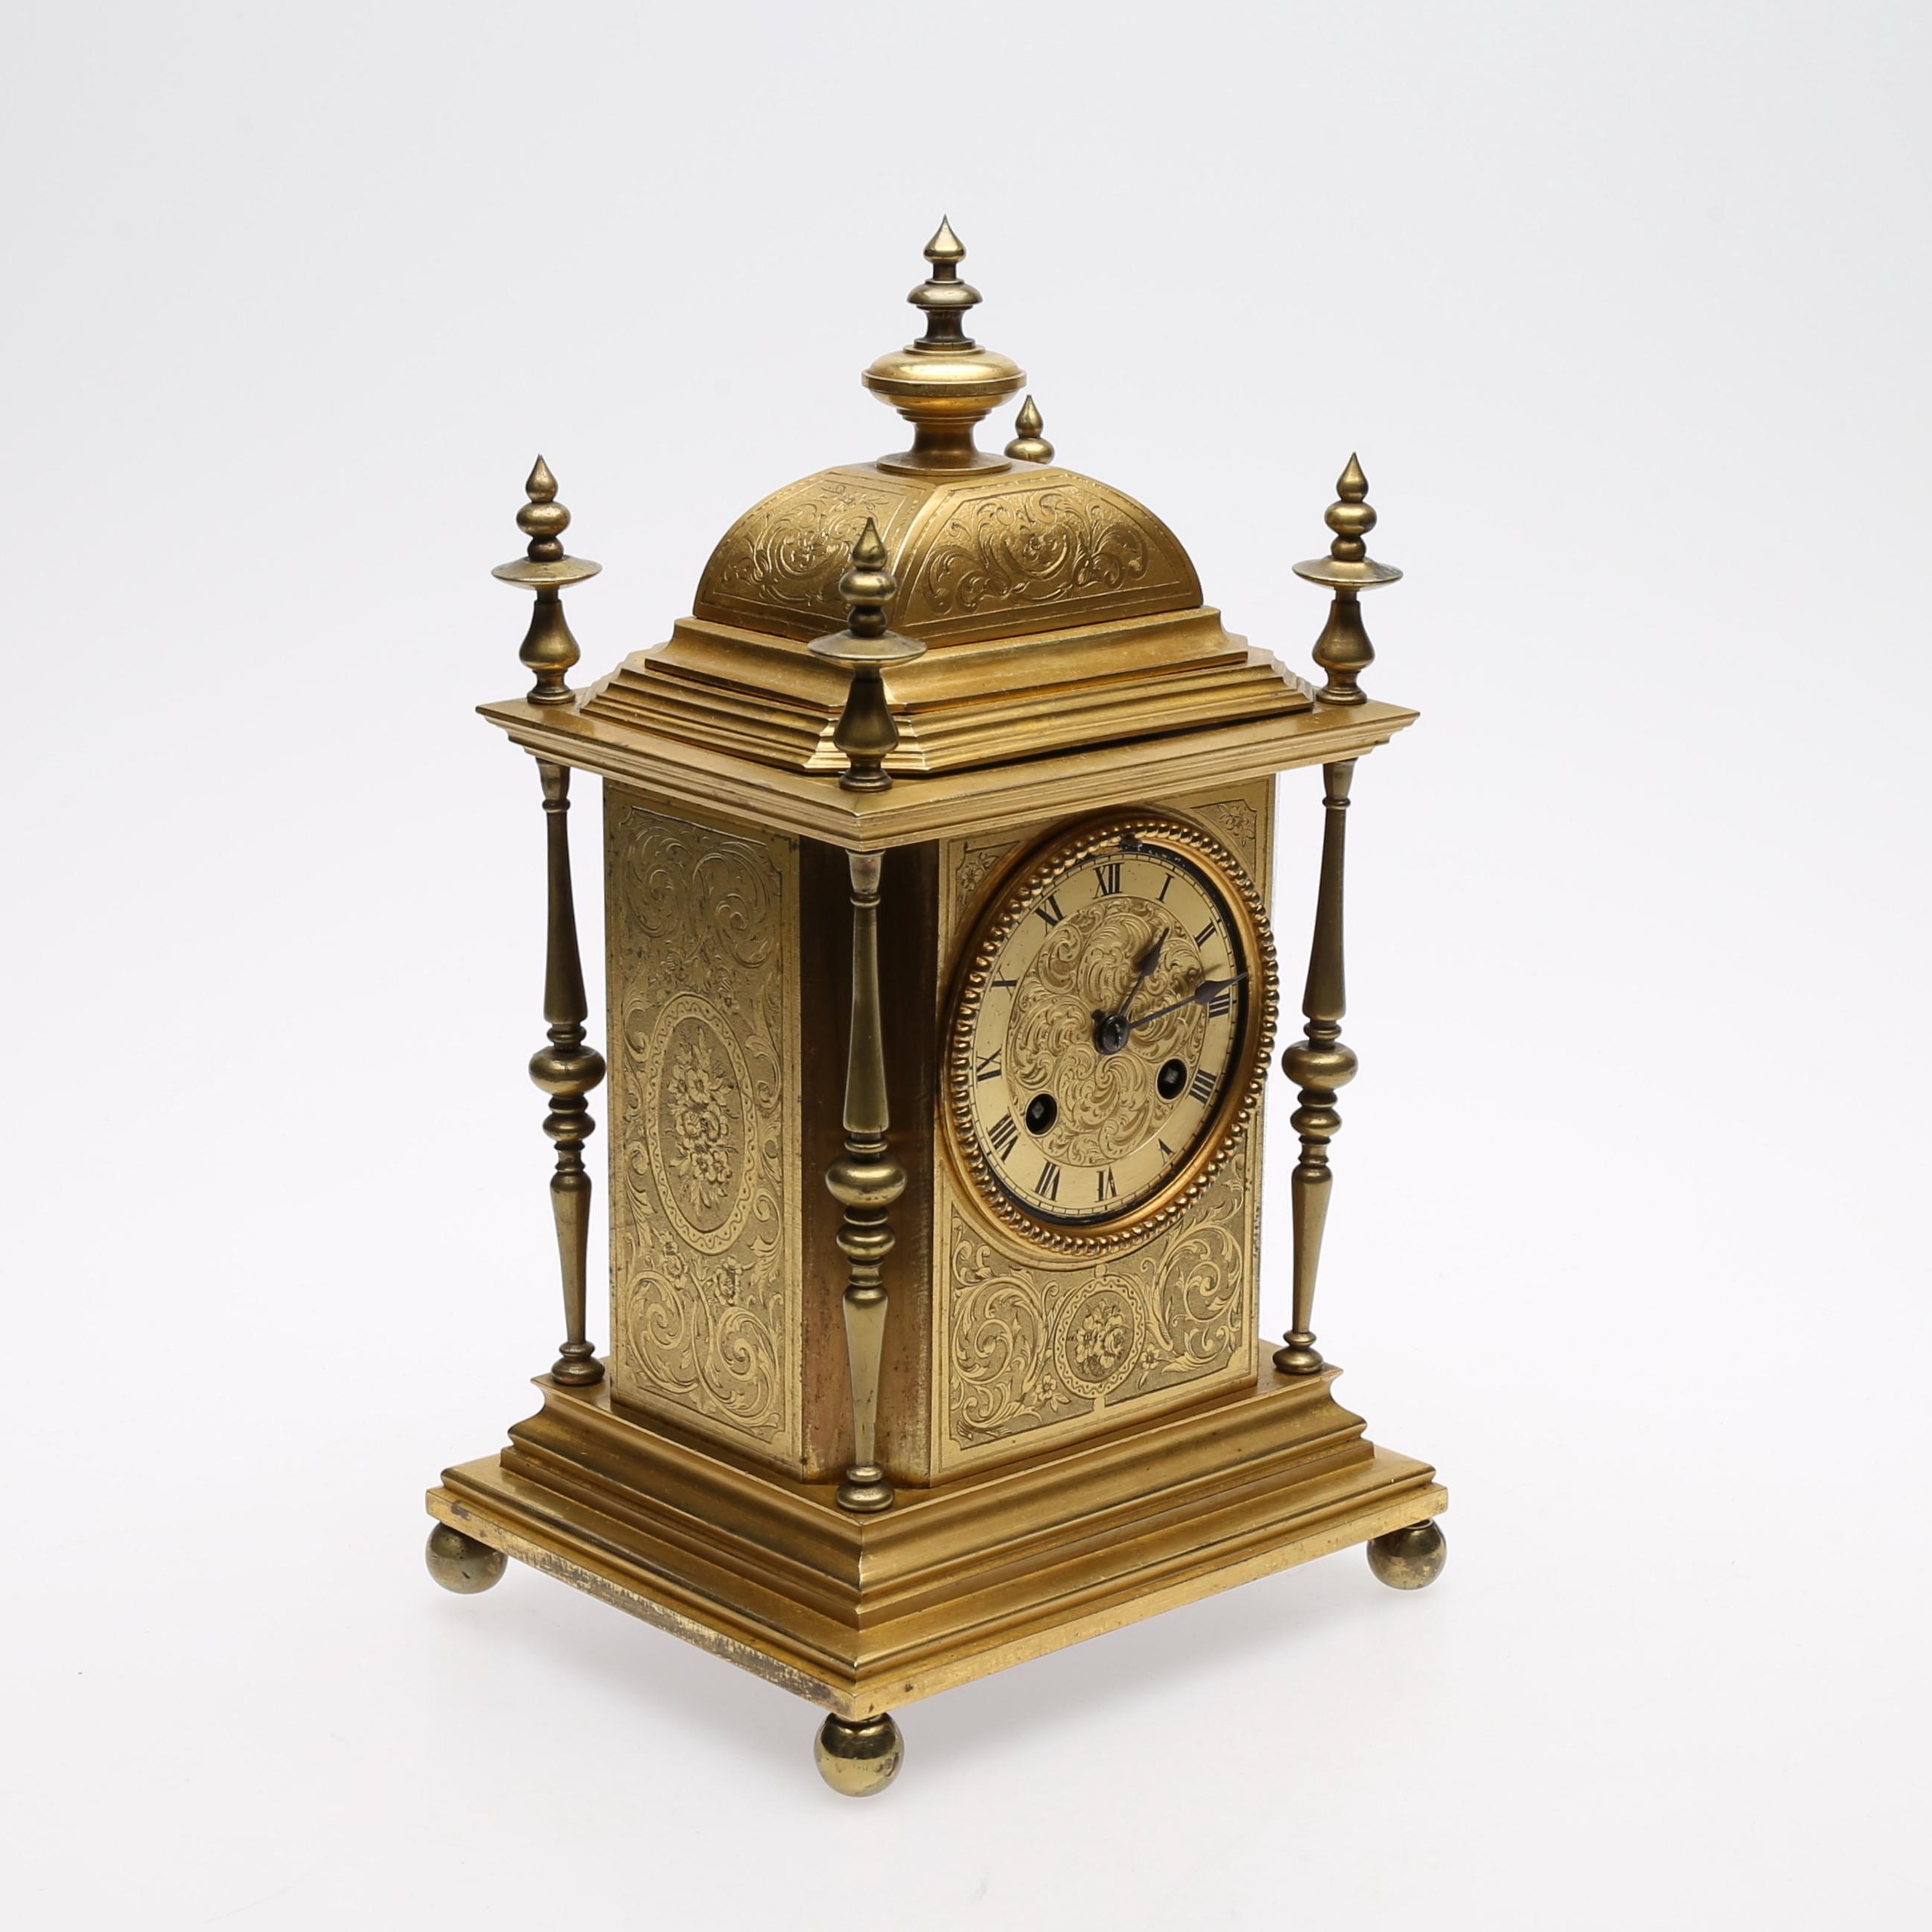 Bordspendyl Berger Paris Brons Med Cicelerad Clocks Watches Table Clocks Auctionet